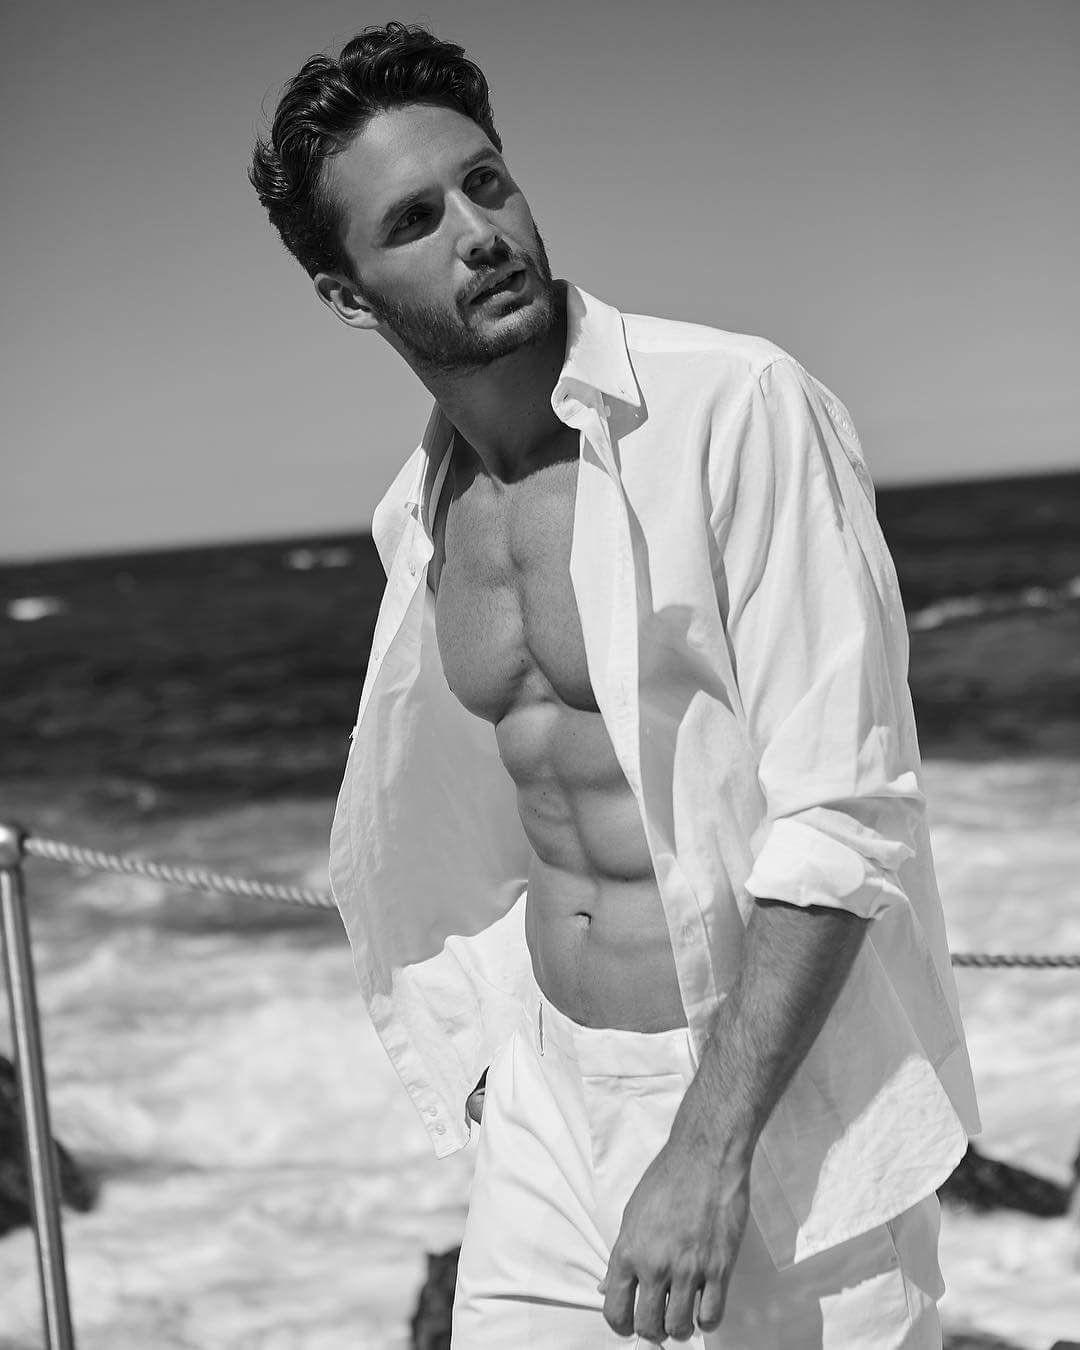 Dejan obradovic male model shirtless black white photography by melinda cartmer